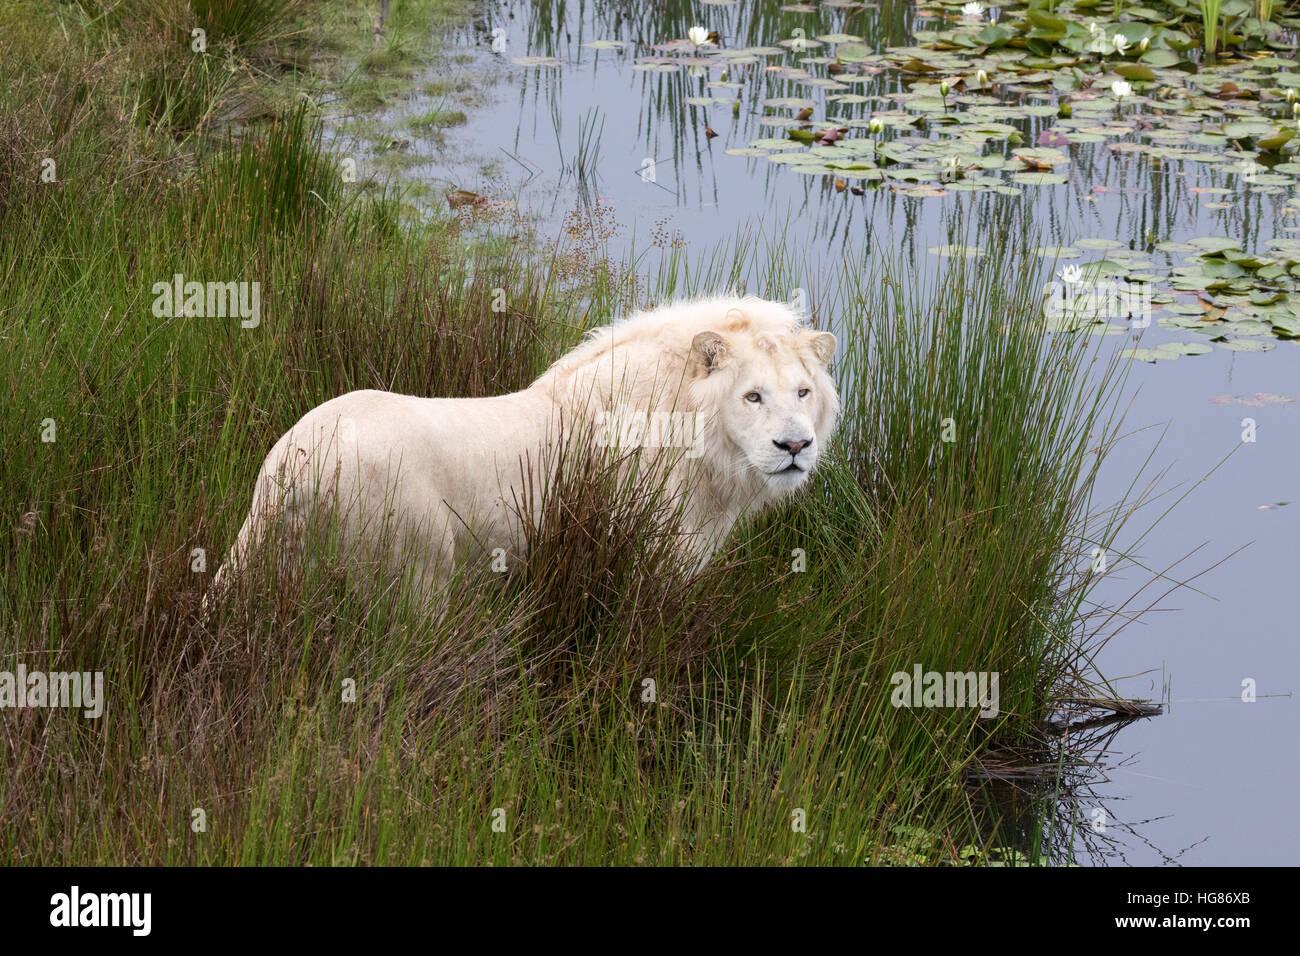 Adult male white lion ( Panthera leo krugeri ),  Tenikwa Wildlife Awareness Centre, South Africa - Stock Image